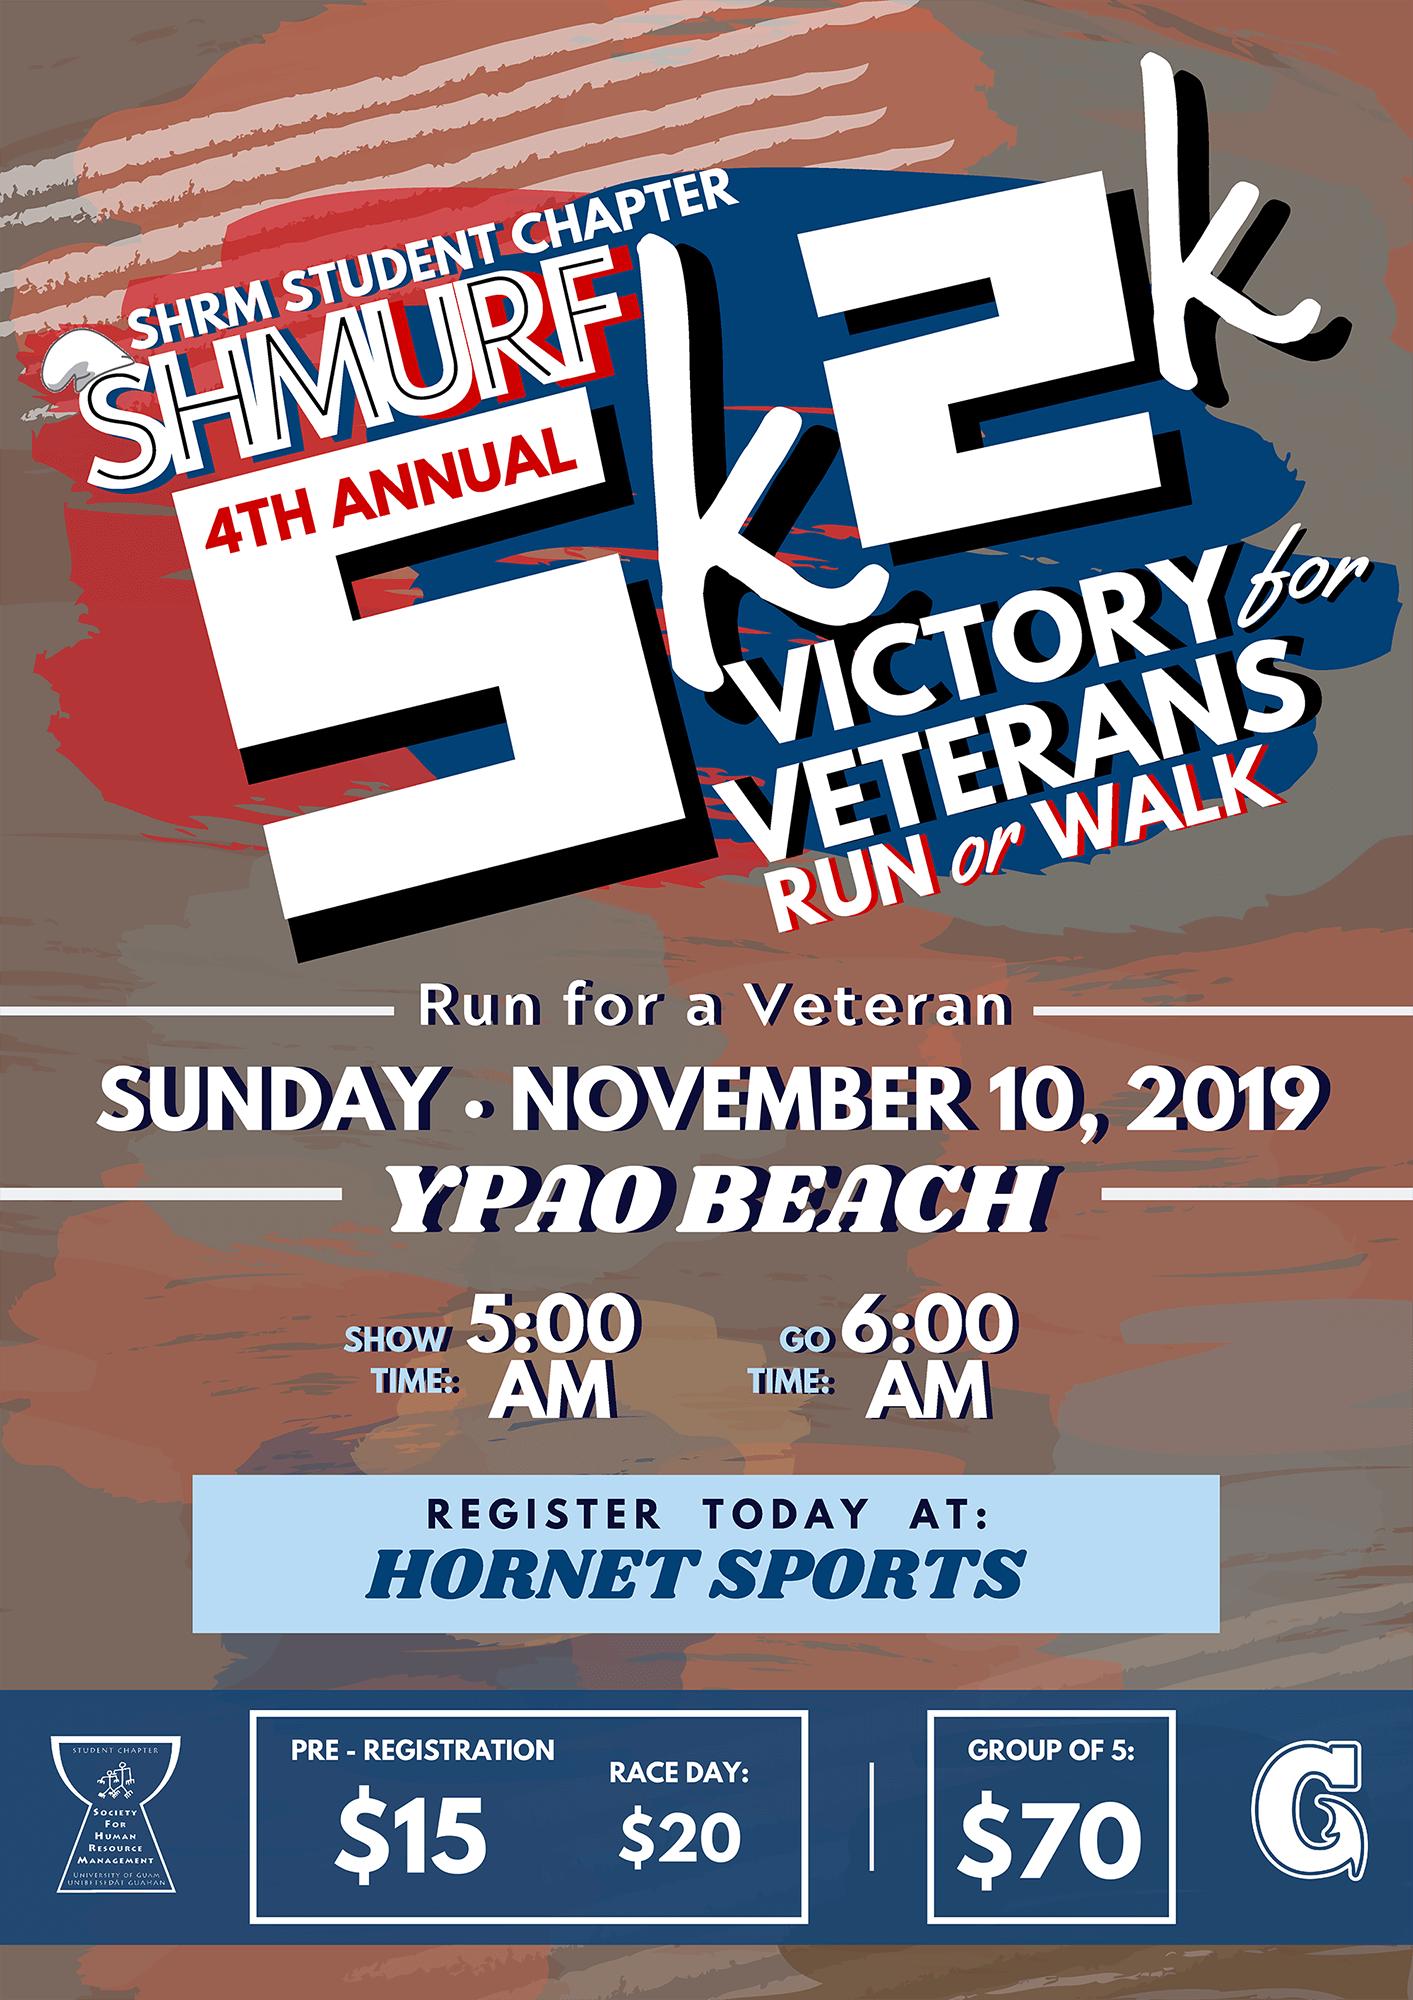 4th Annual 5K/2K Victory for Veterans Run/Walk